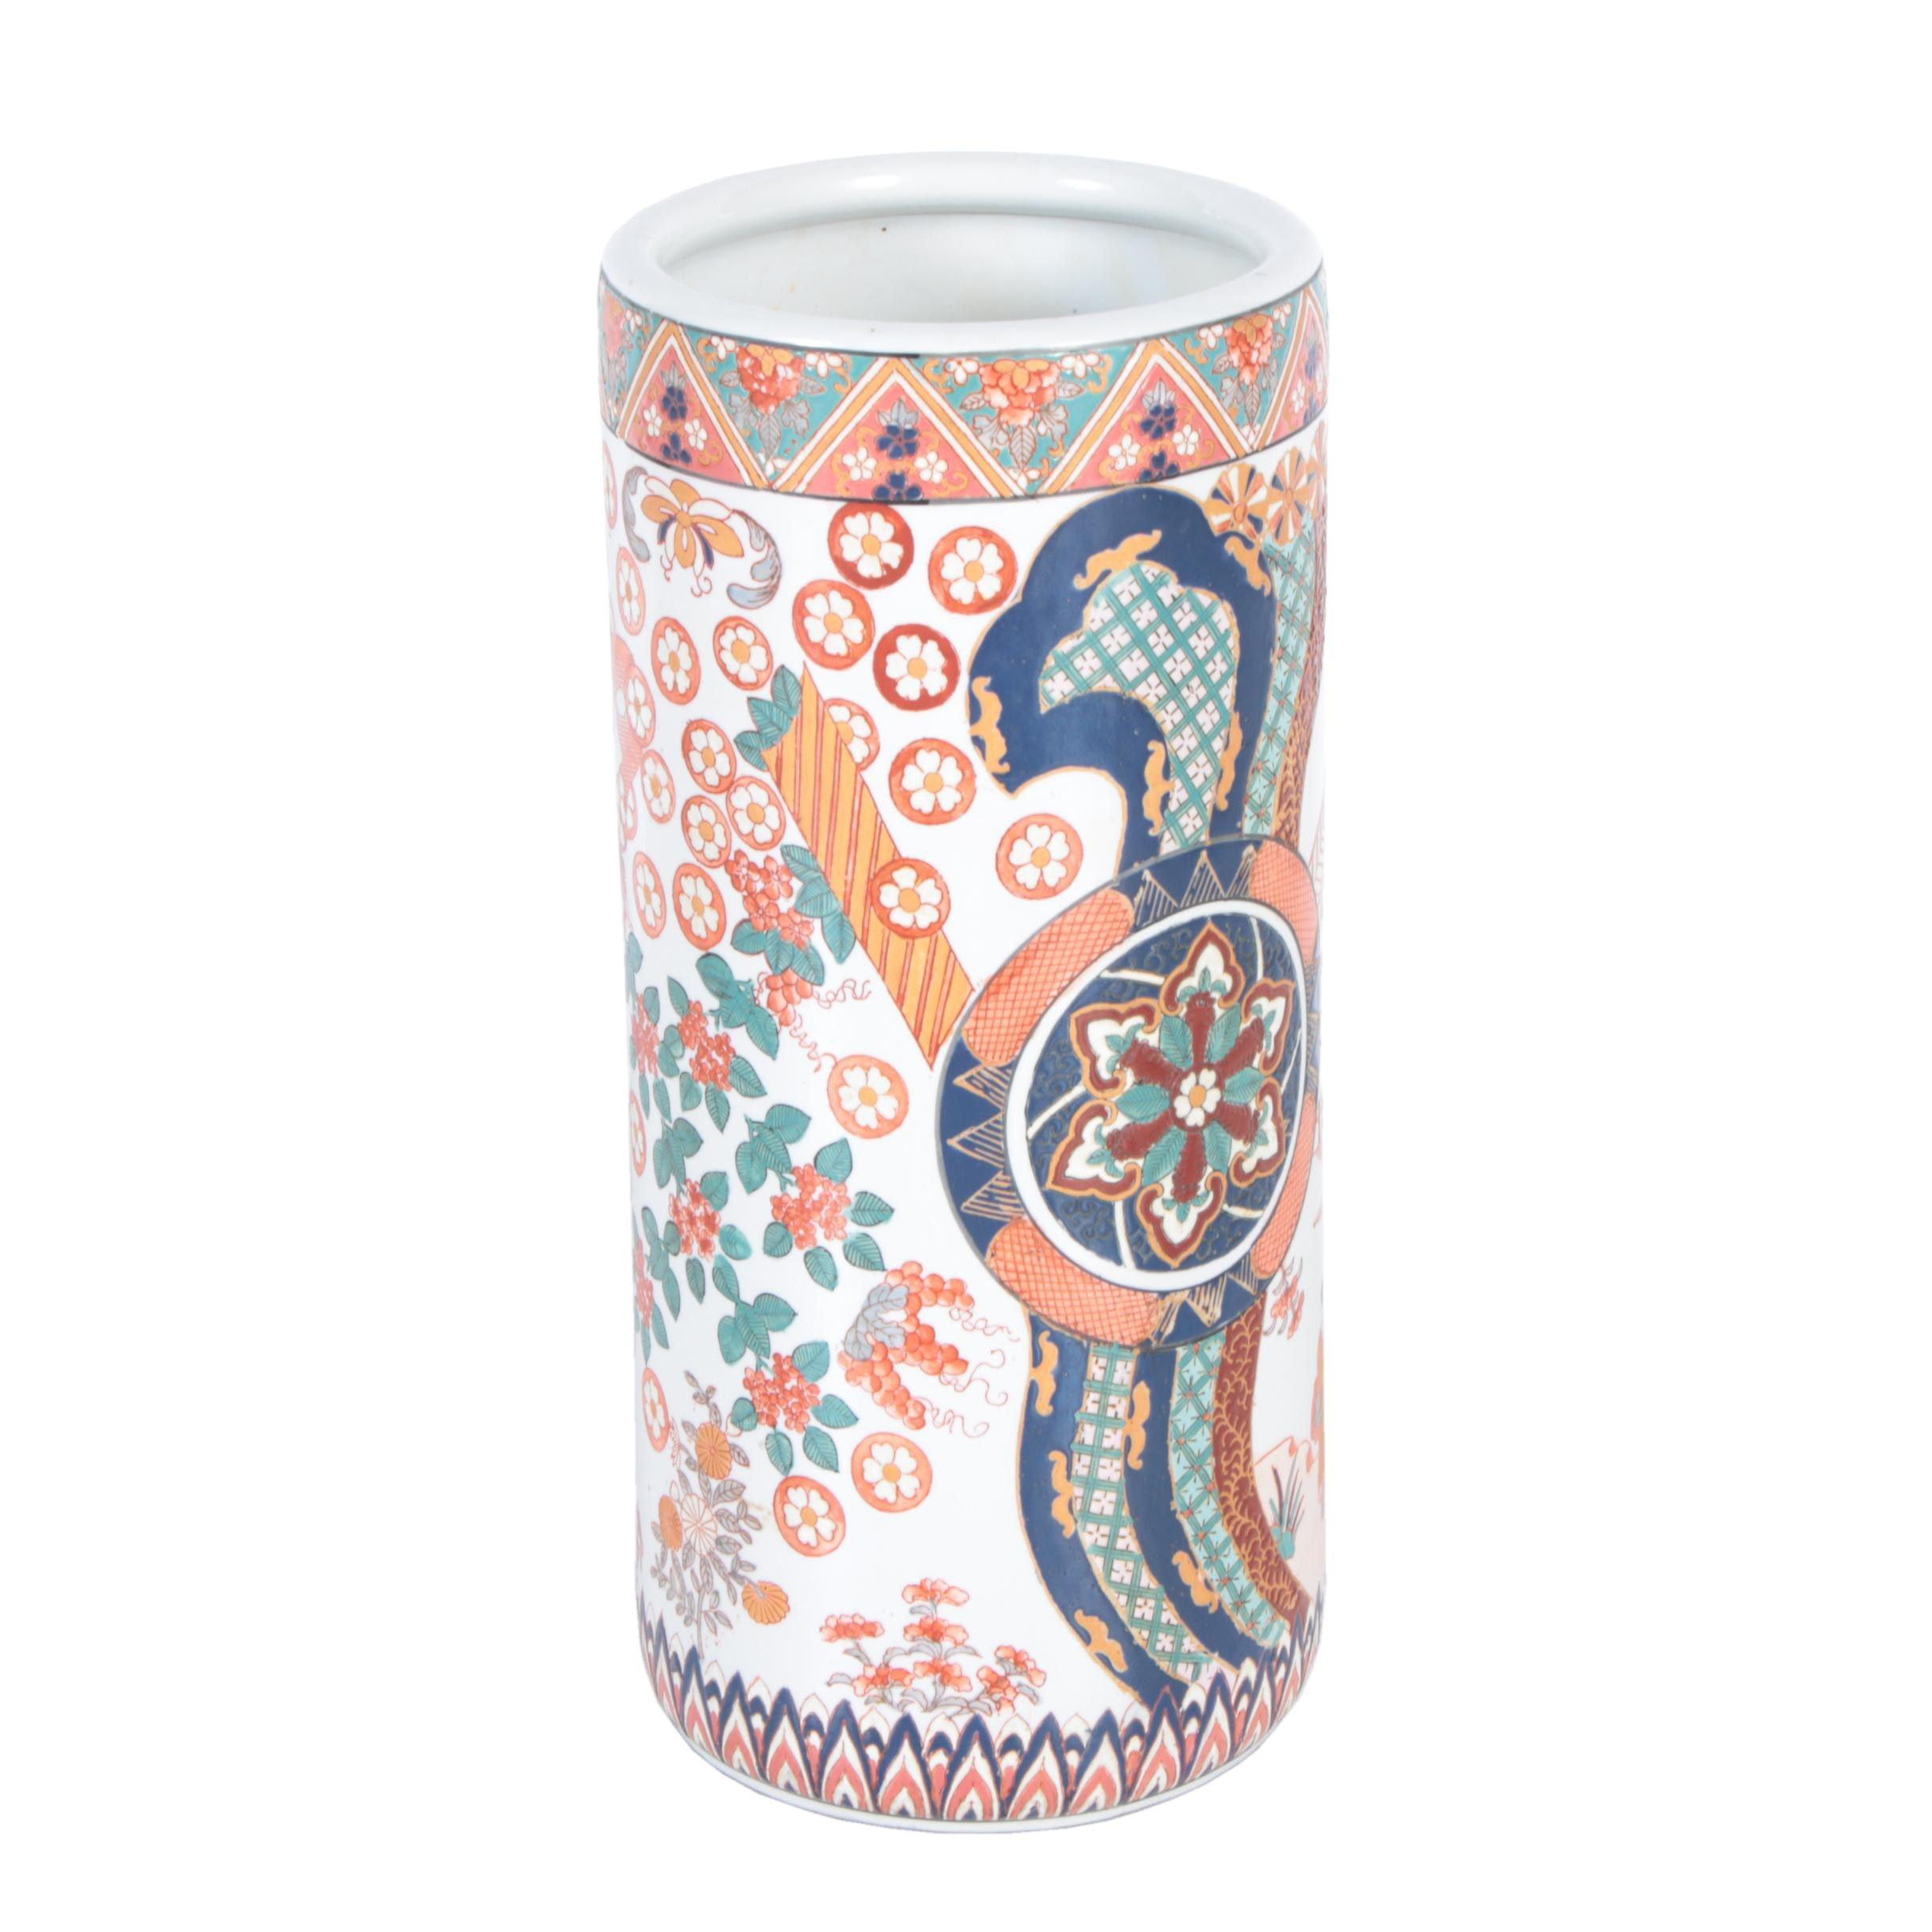 East Asian Enameled Porcelain Umbrella Stand